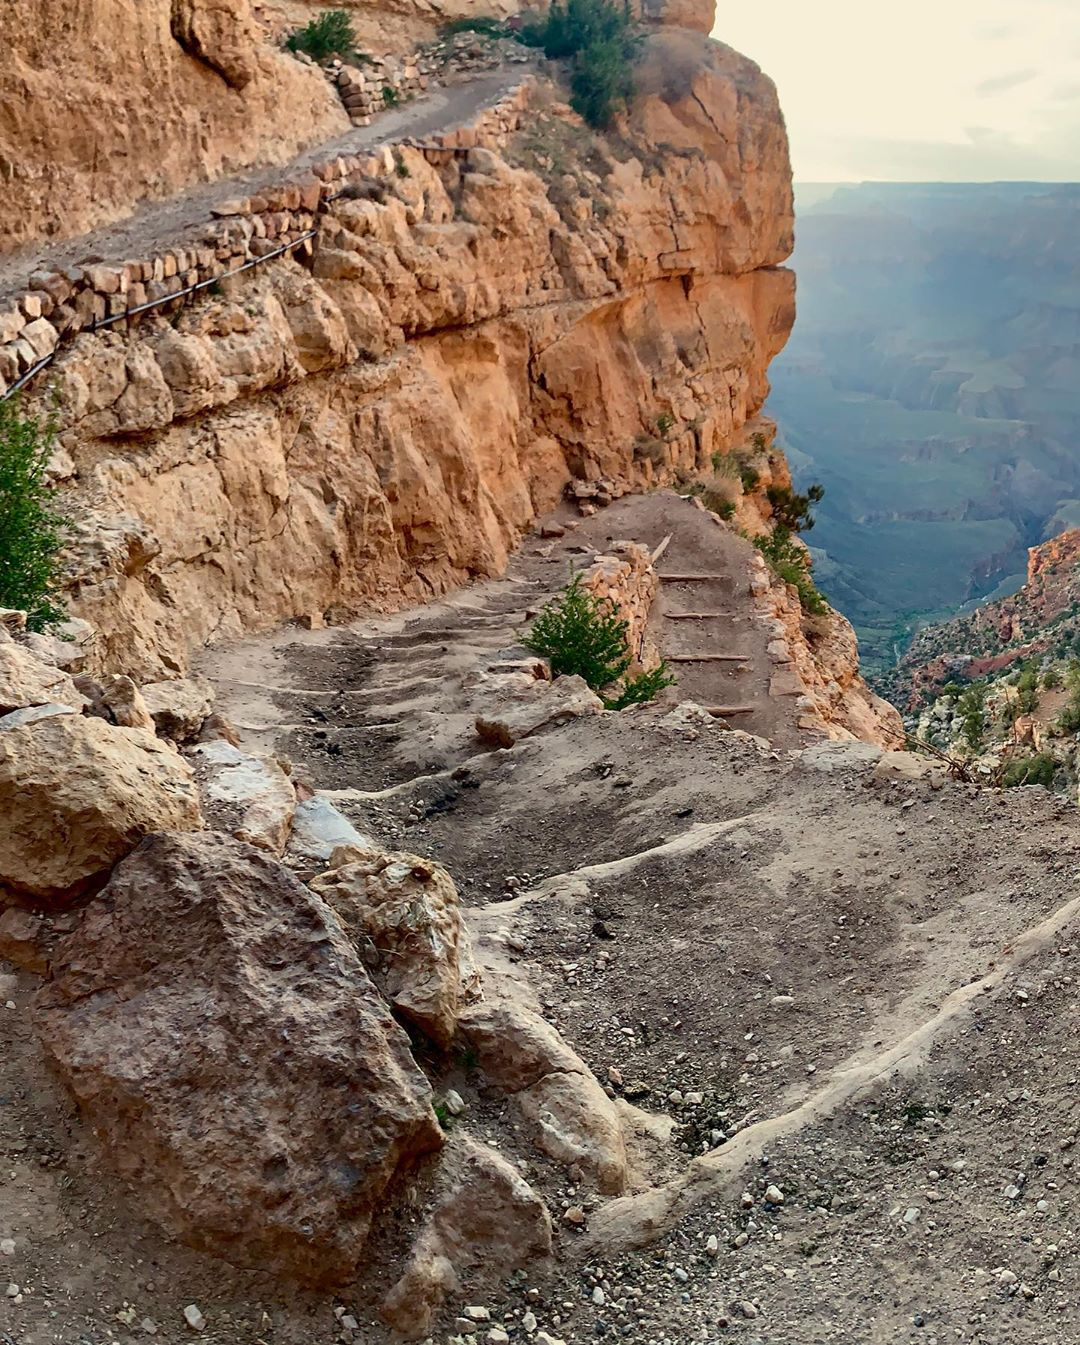 South Kaibab Trail Hike ooh ahh point grand canyon az